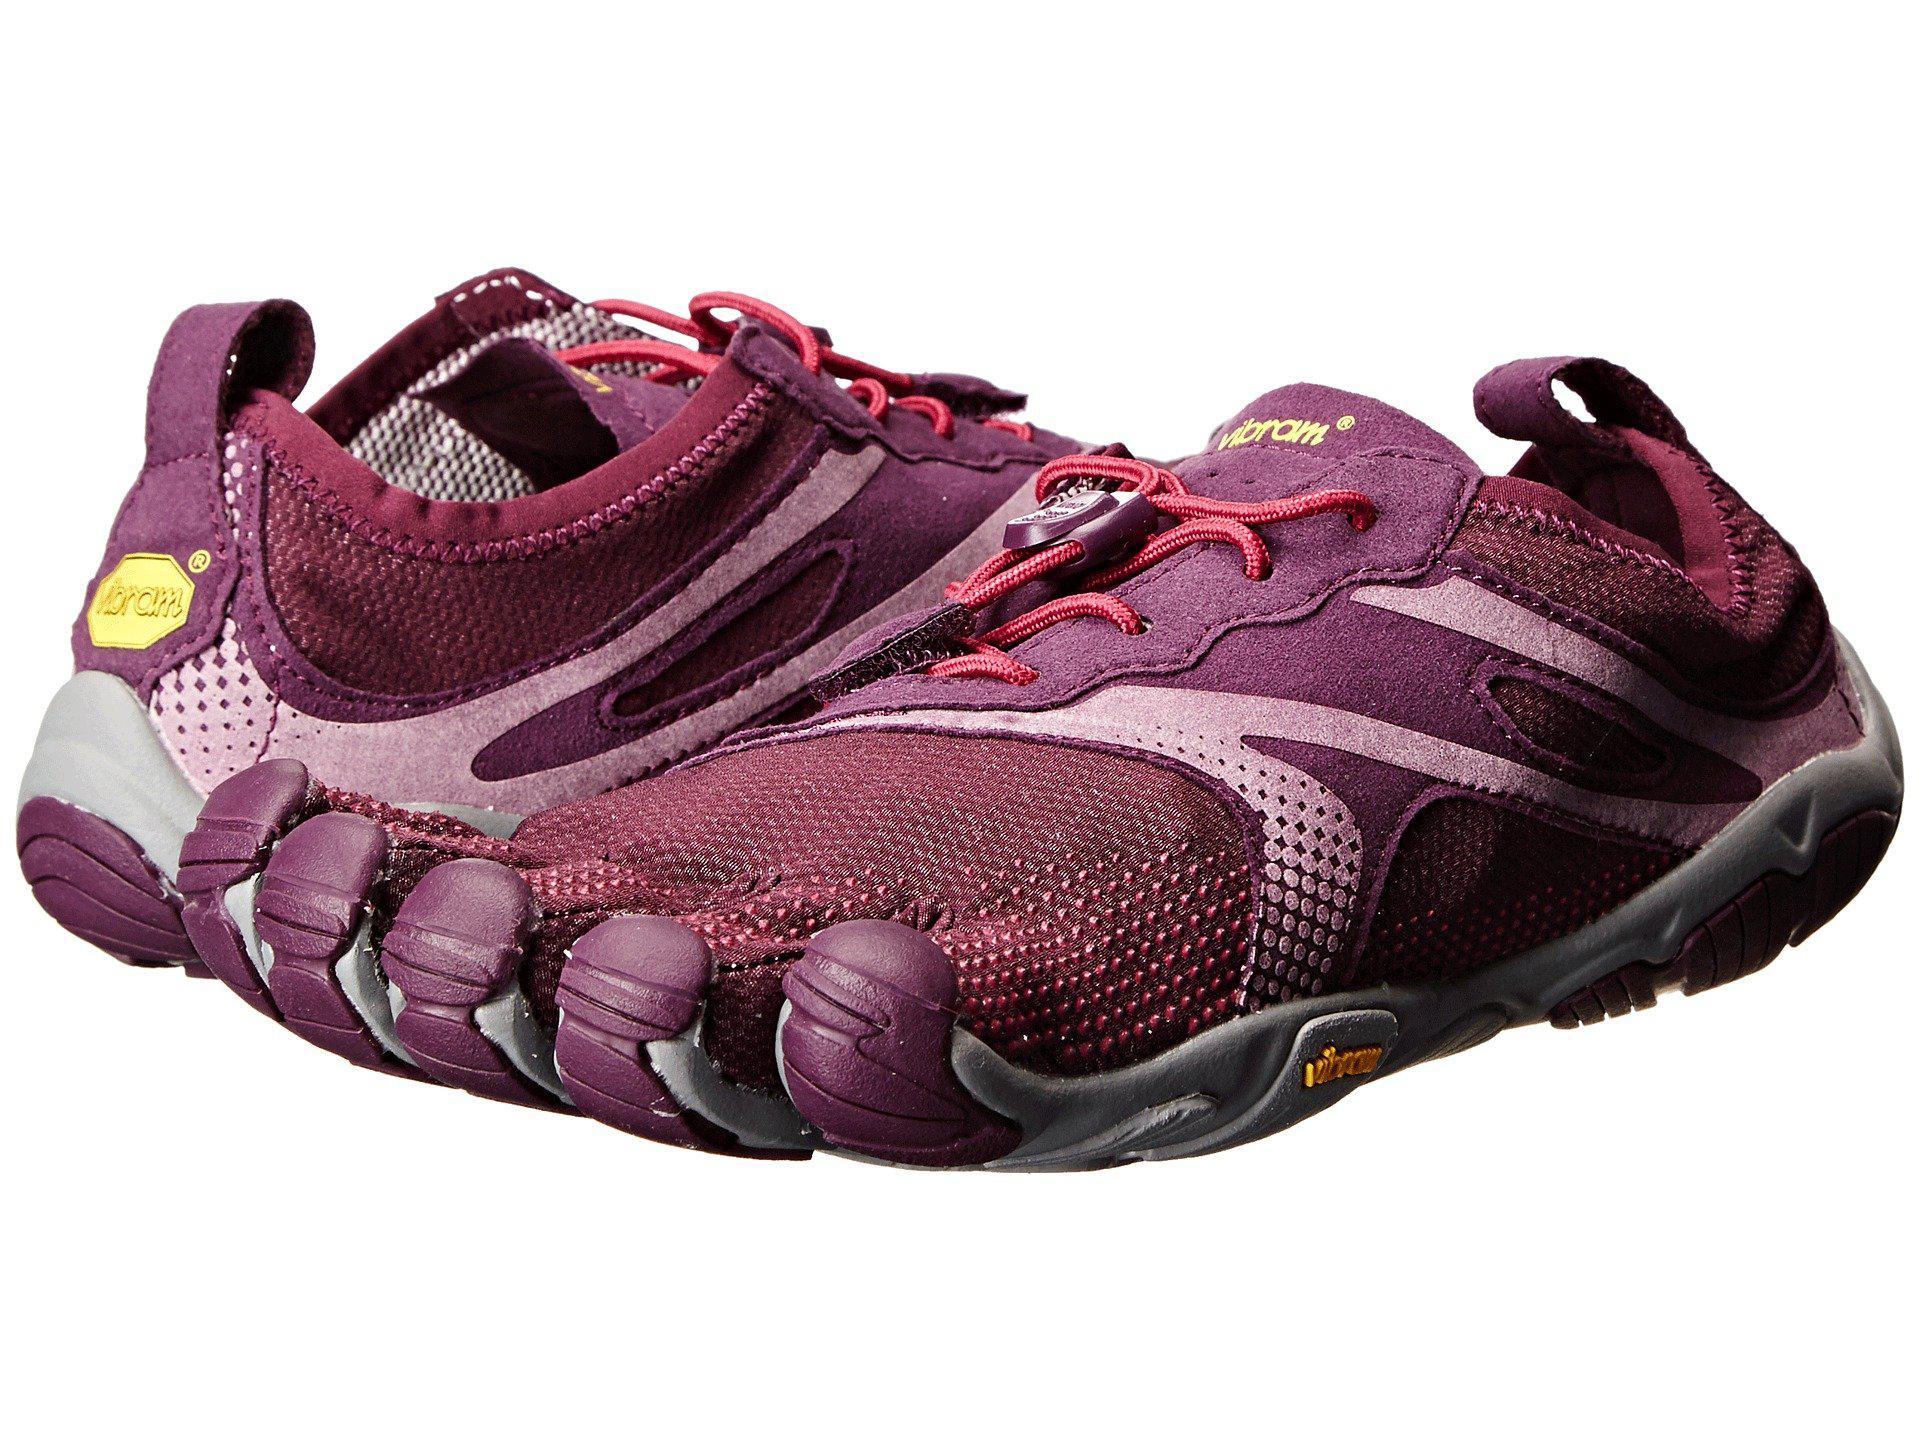 promo code 4e499 947c5 Lyst - Vibram Fivefingers Bikila Evo in Purple for Men ...